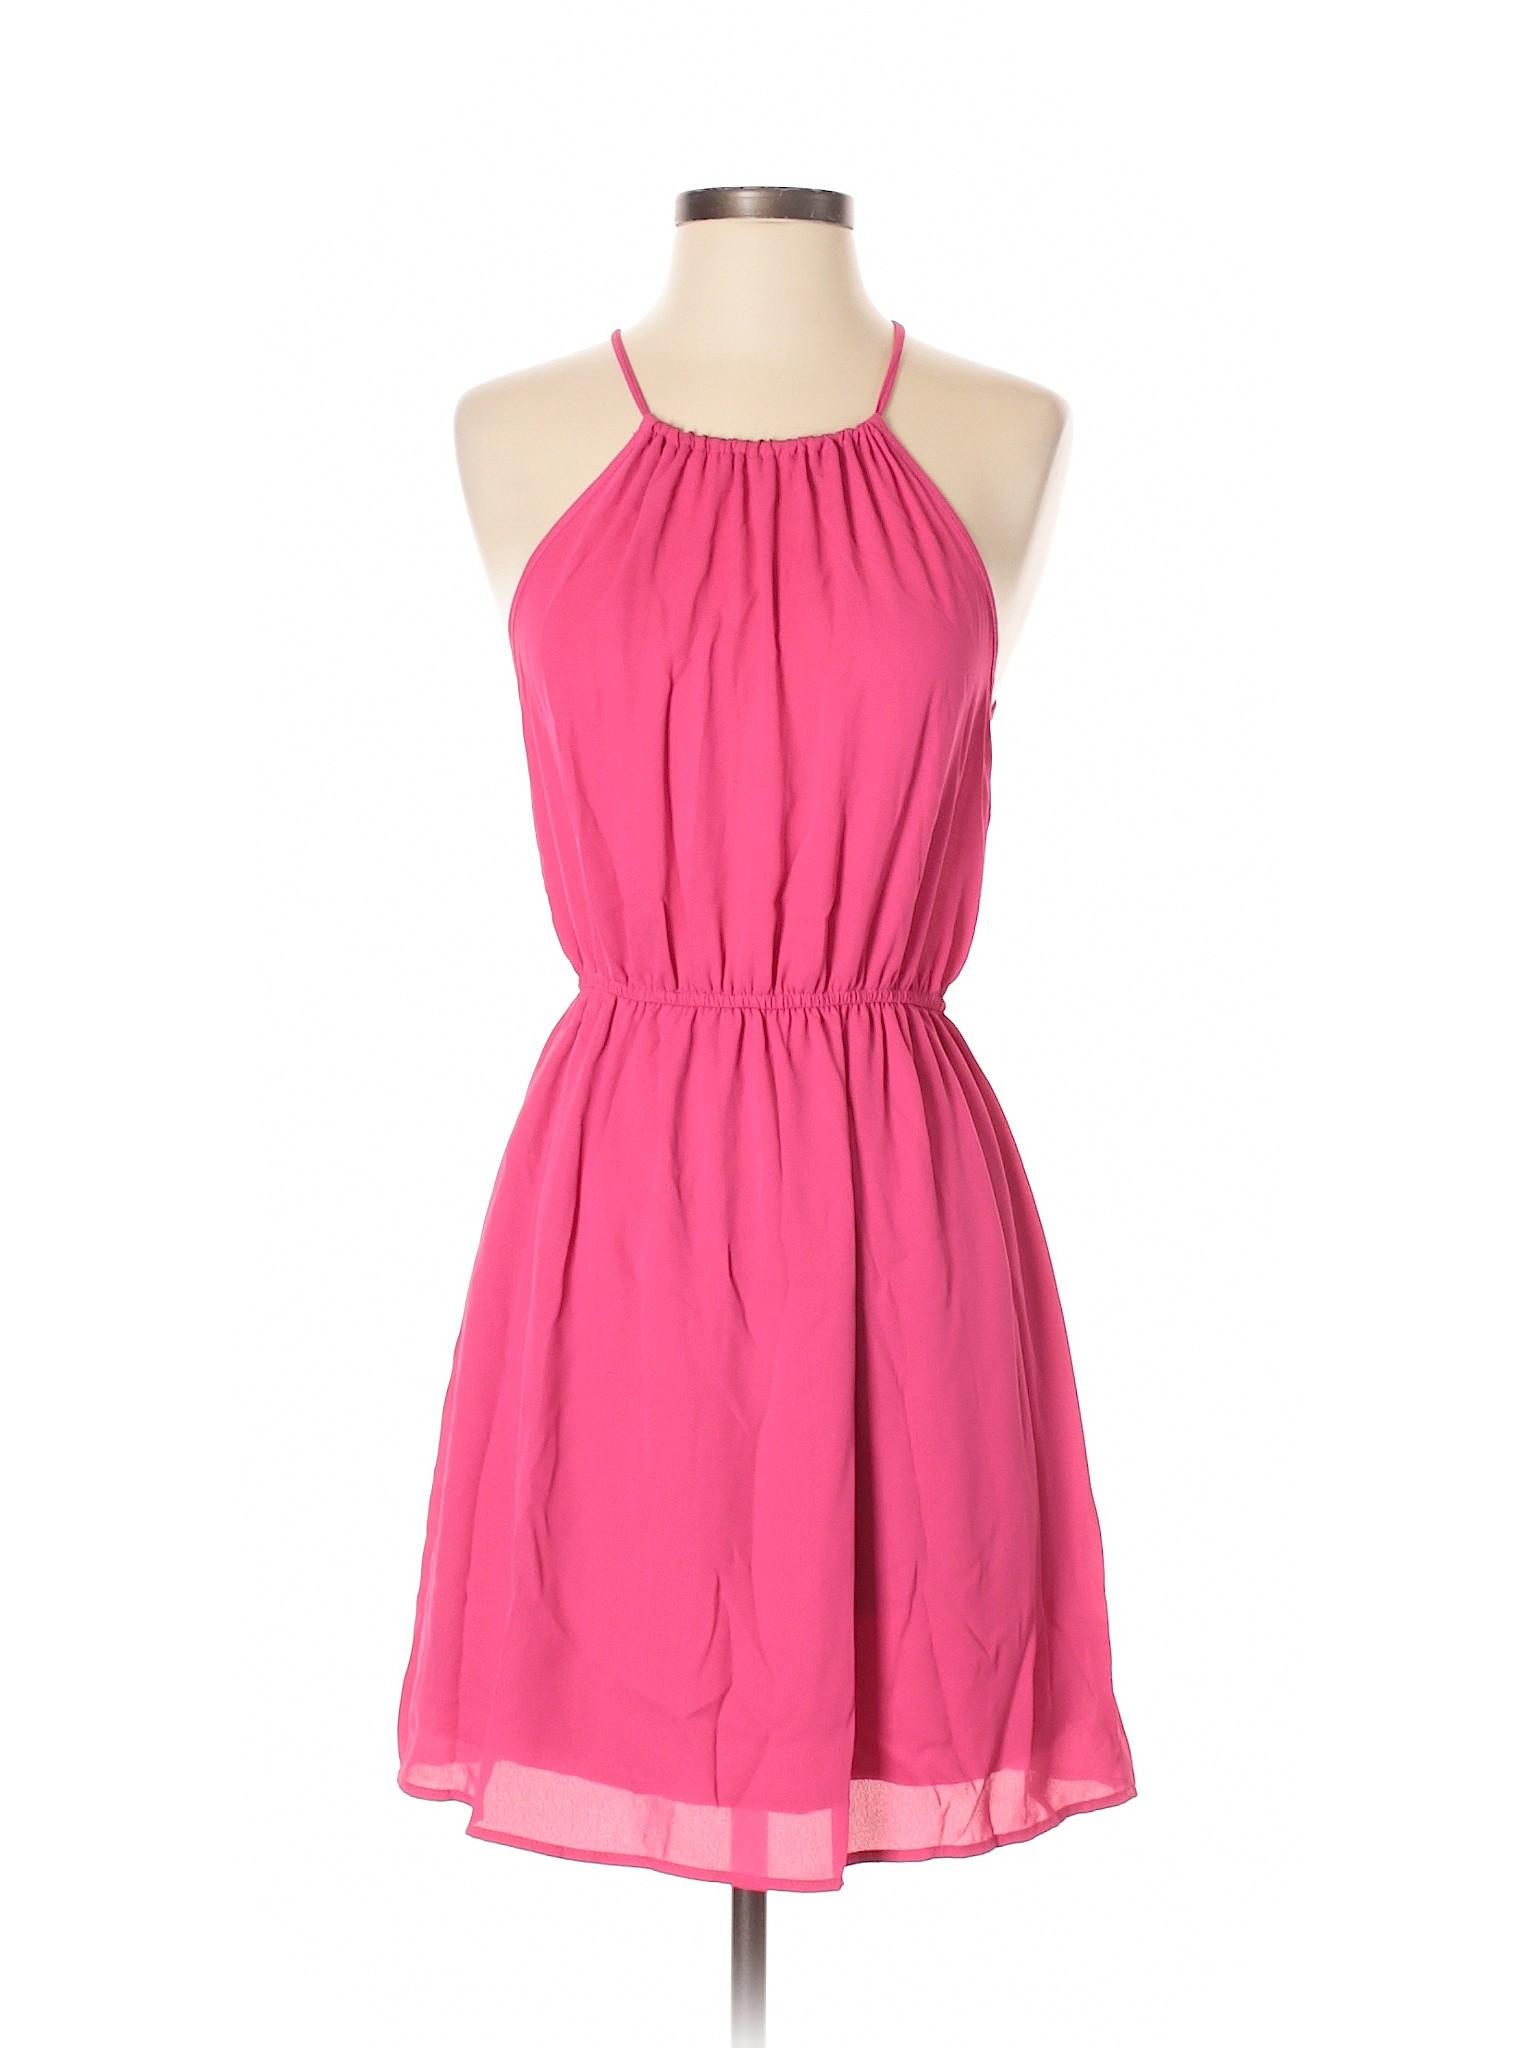 Casual Selling Selling Soprano Dress Casual Dress Casual Selling Soprano Soprano Dress Selling E7qXZFw